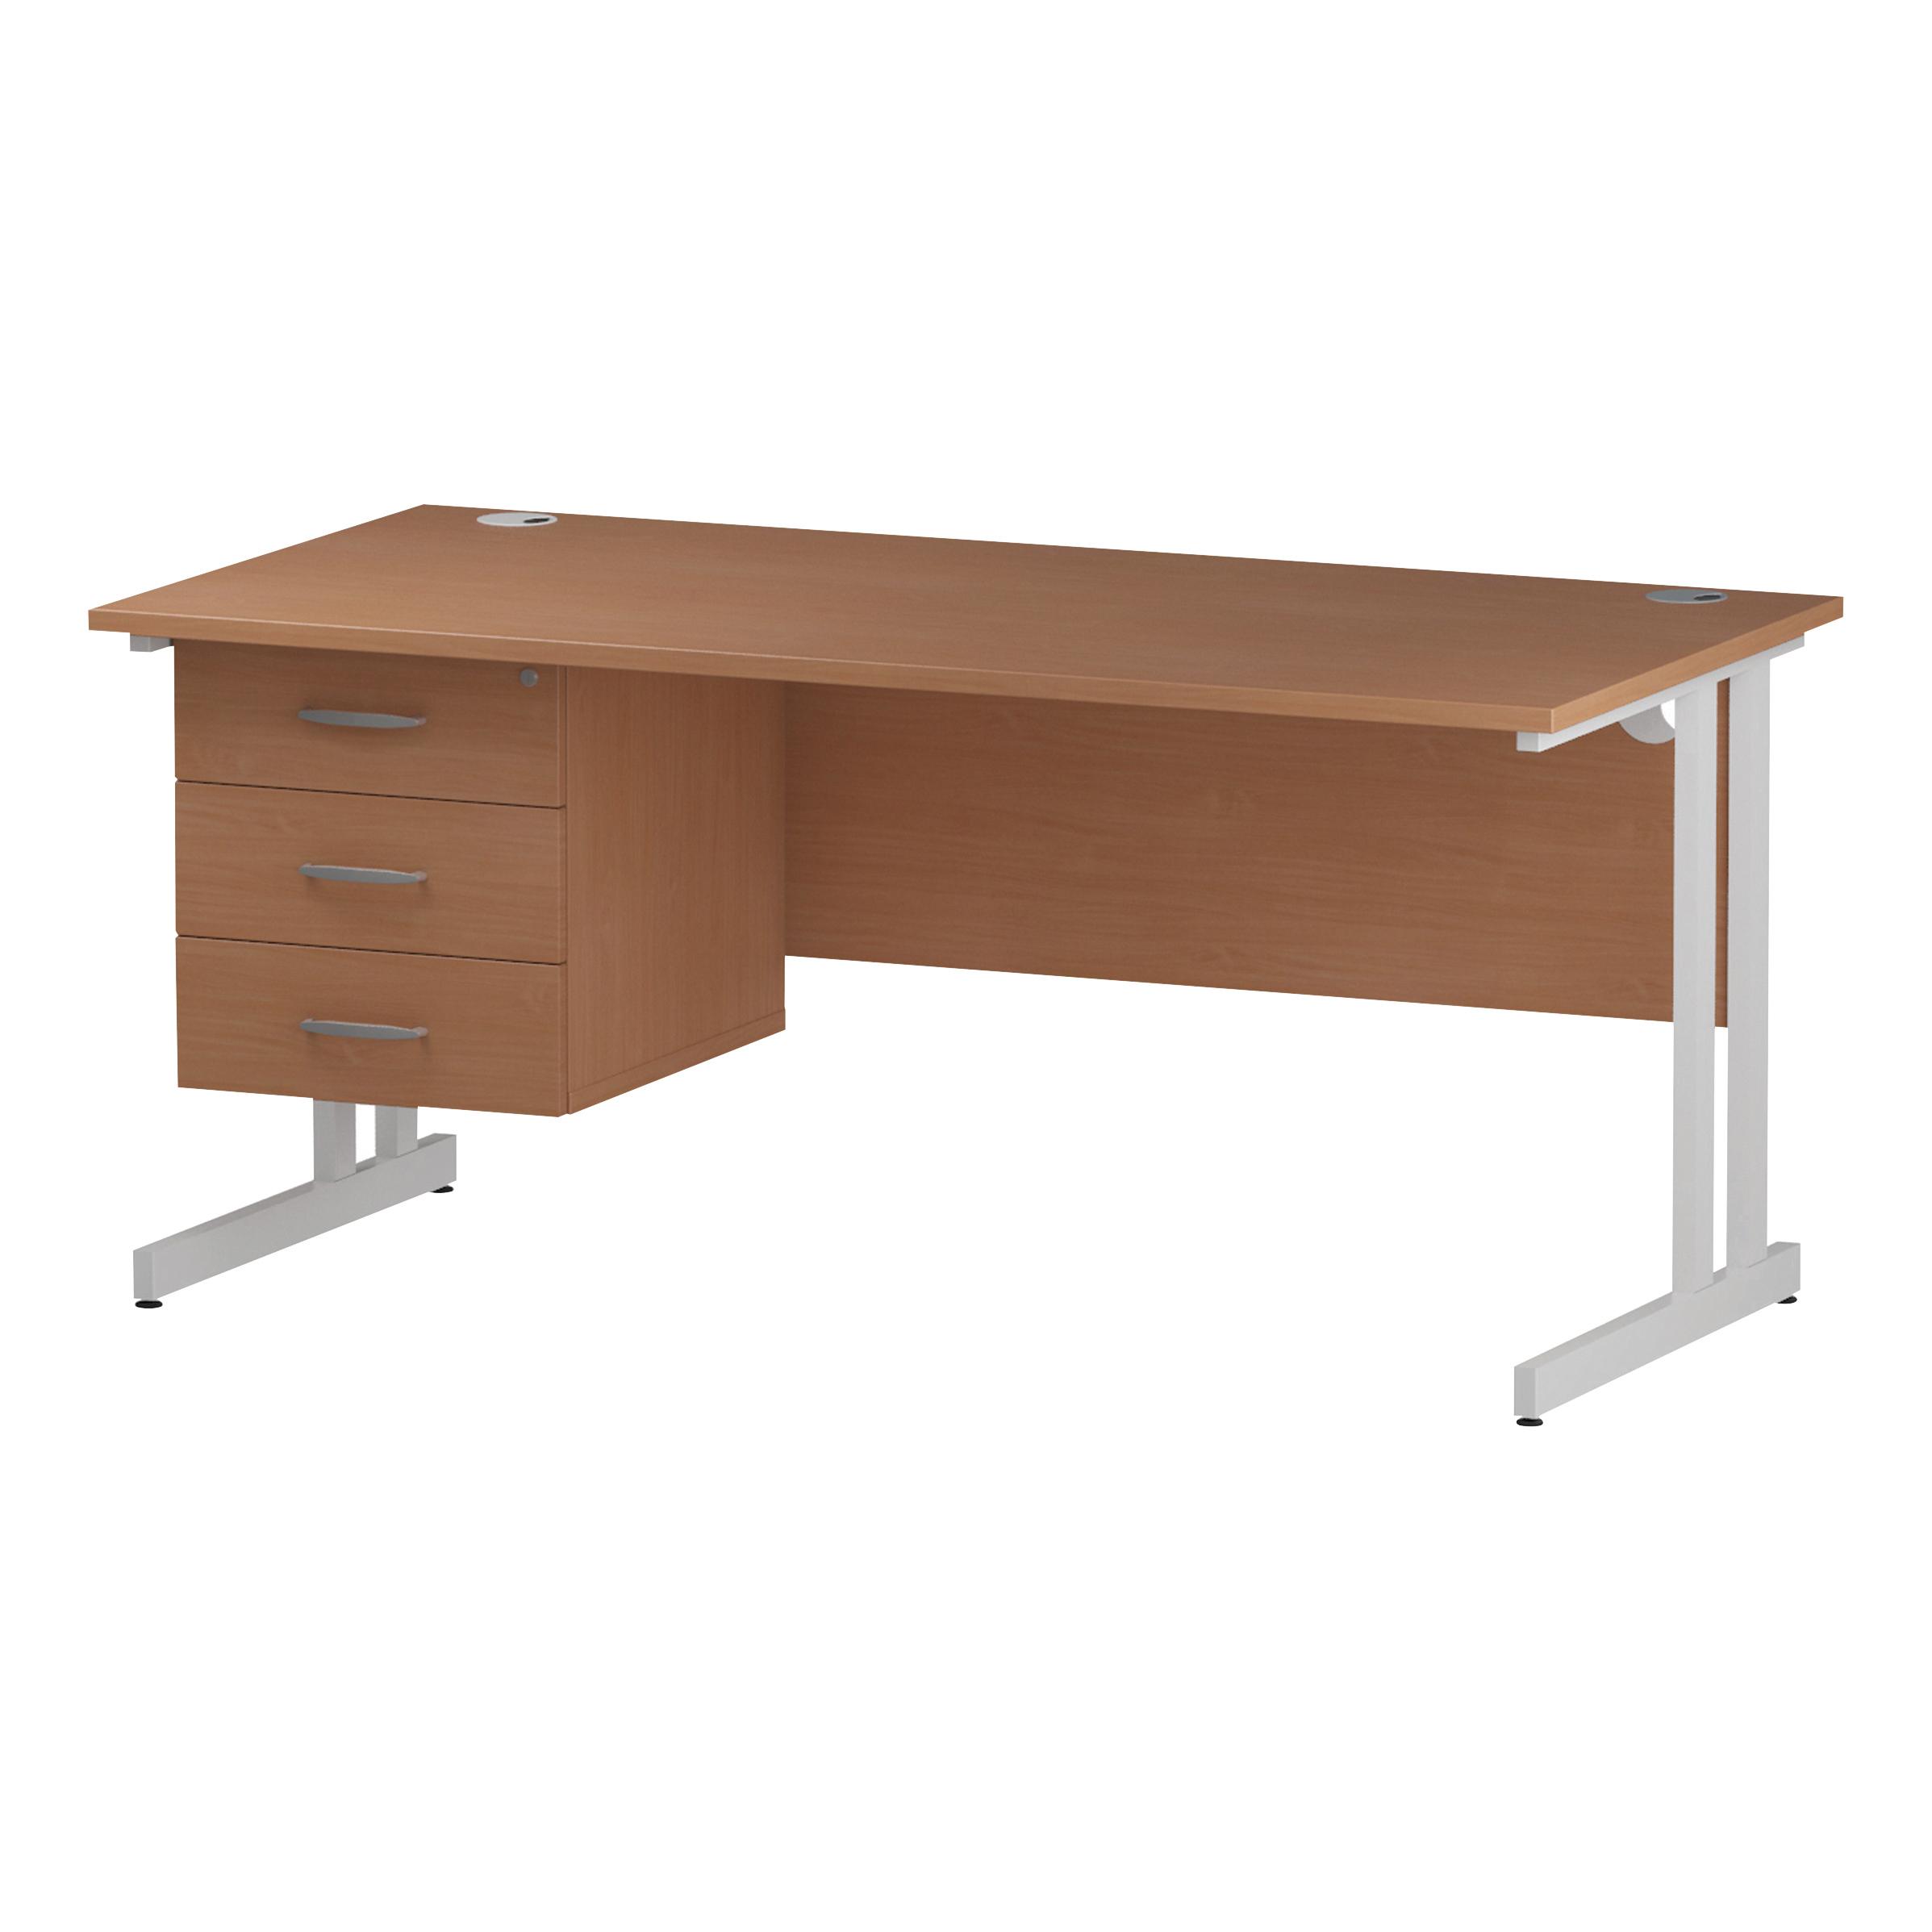 Trexus Rectangular Desk White Cantilever Leg 1600x800mm Fixed Pedestal 3 Drawers Beech Ref I001702